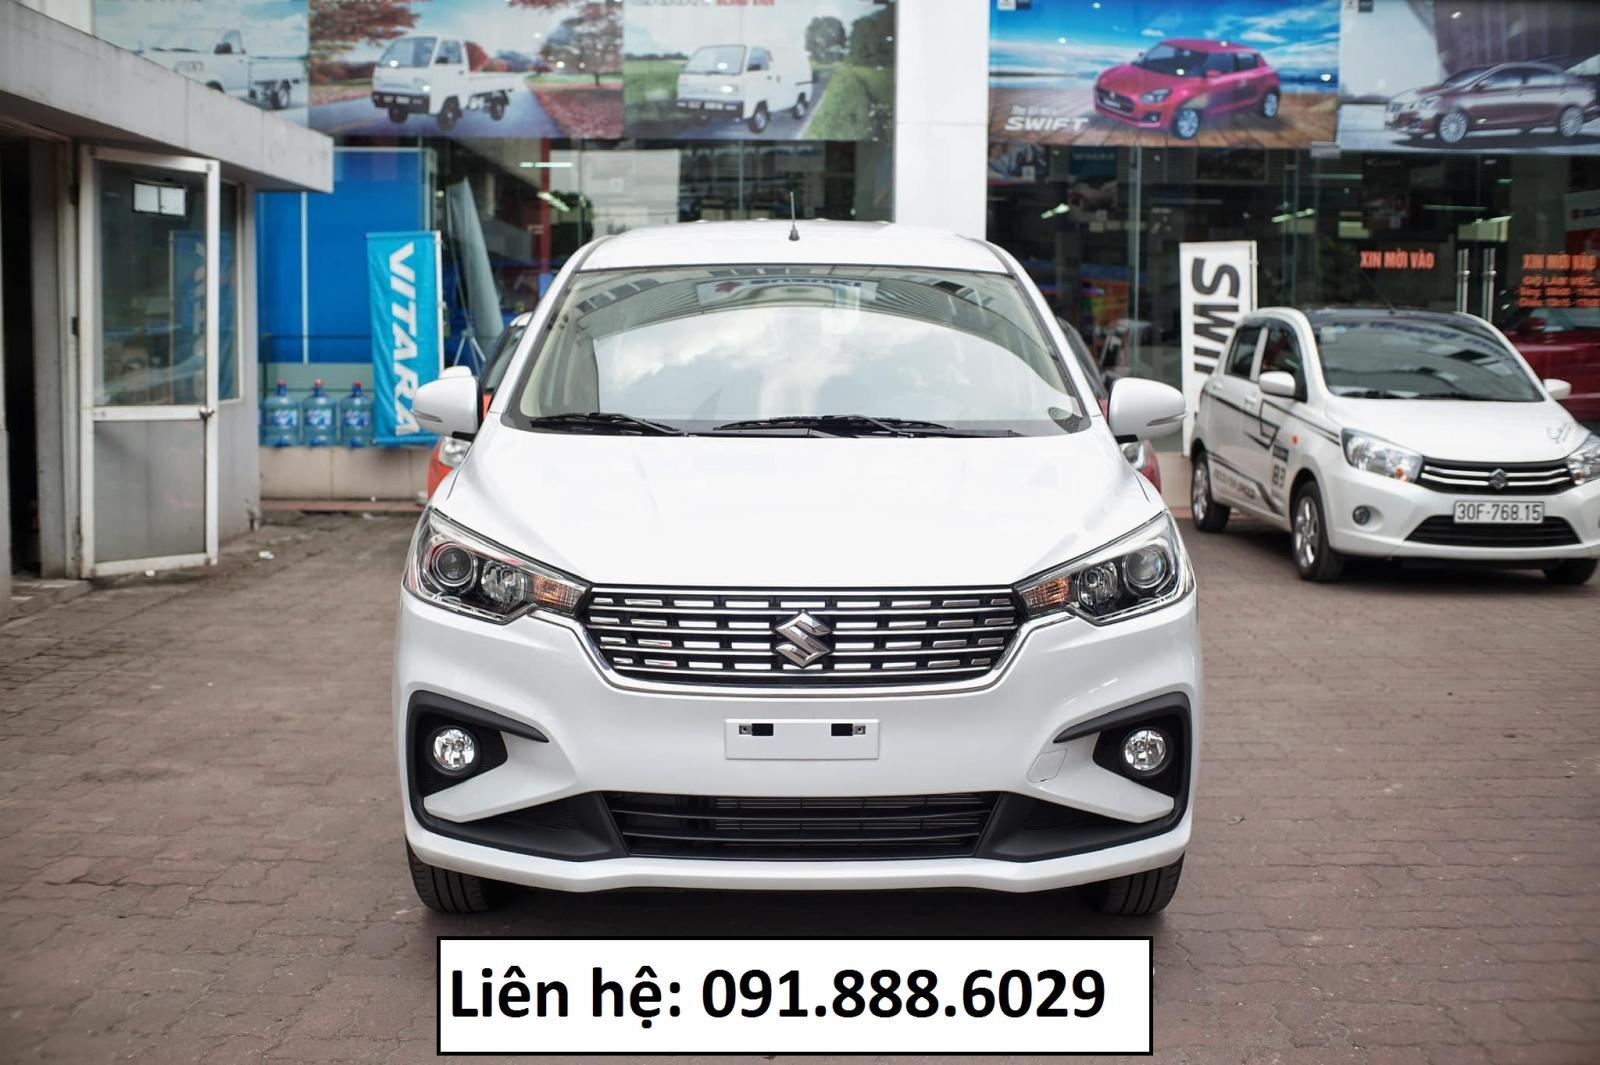 Ban Xe Suzuki Ertiga 2019 Mau Xam Tại Quảng Ninh 0918886029